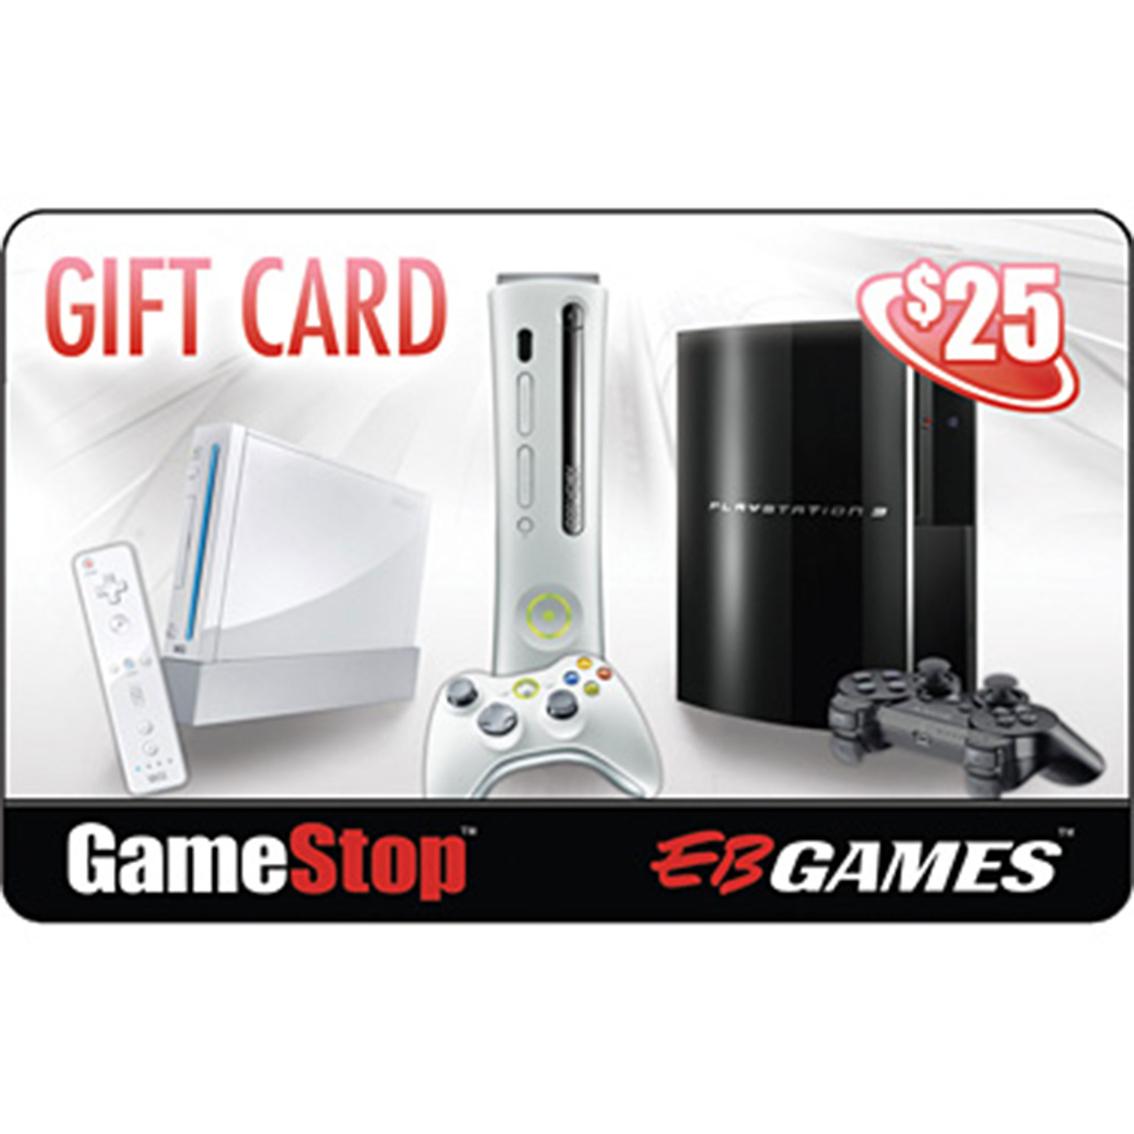 gamestop gift card music gaming gifts food shop the exchange. Black Bedroom Furniture Sets. Home Design Ideas